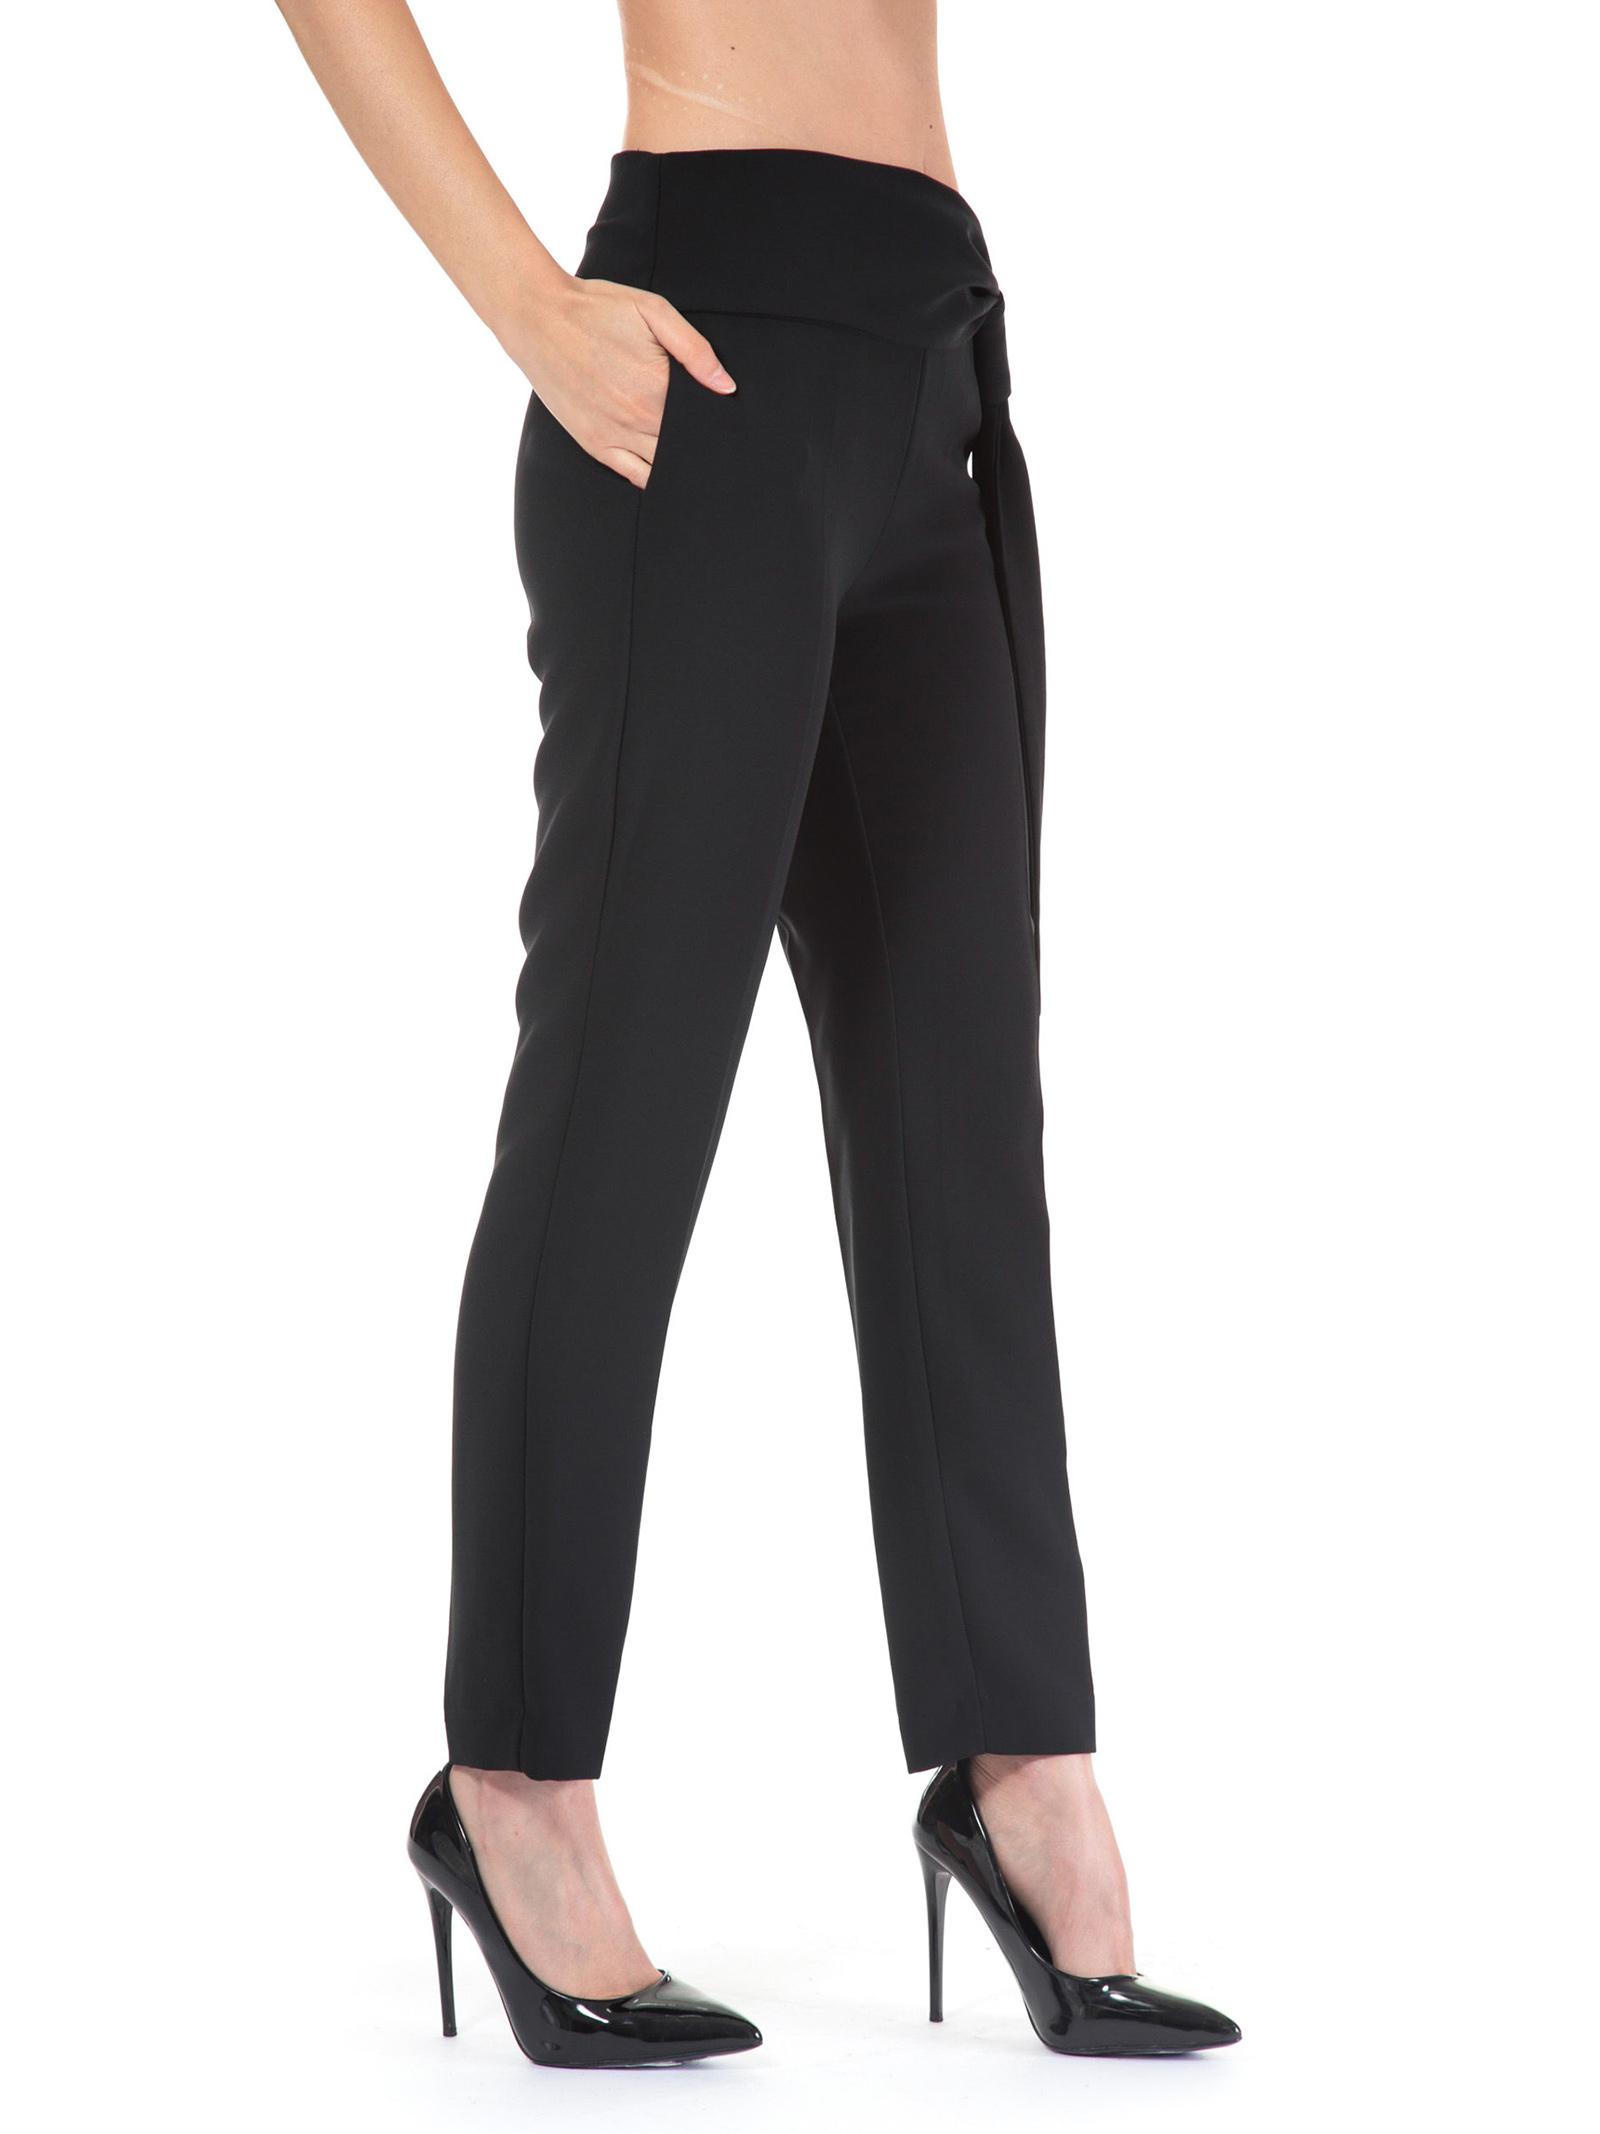 pantalone cristinaeffe joel CRISTINAEFFE | Pantaloni | 04392334002